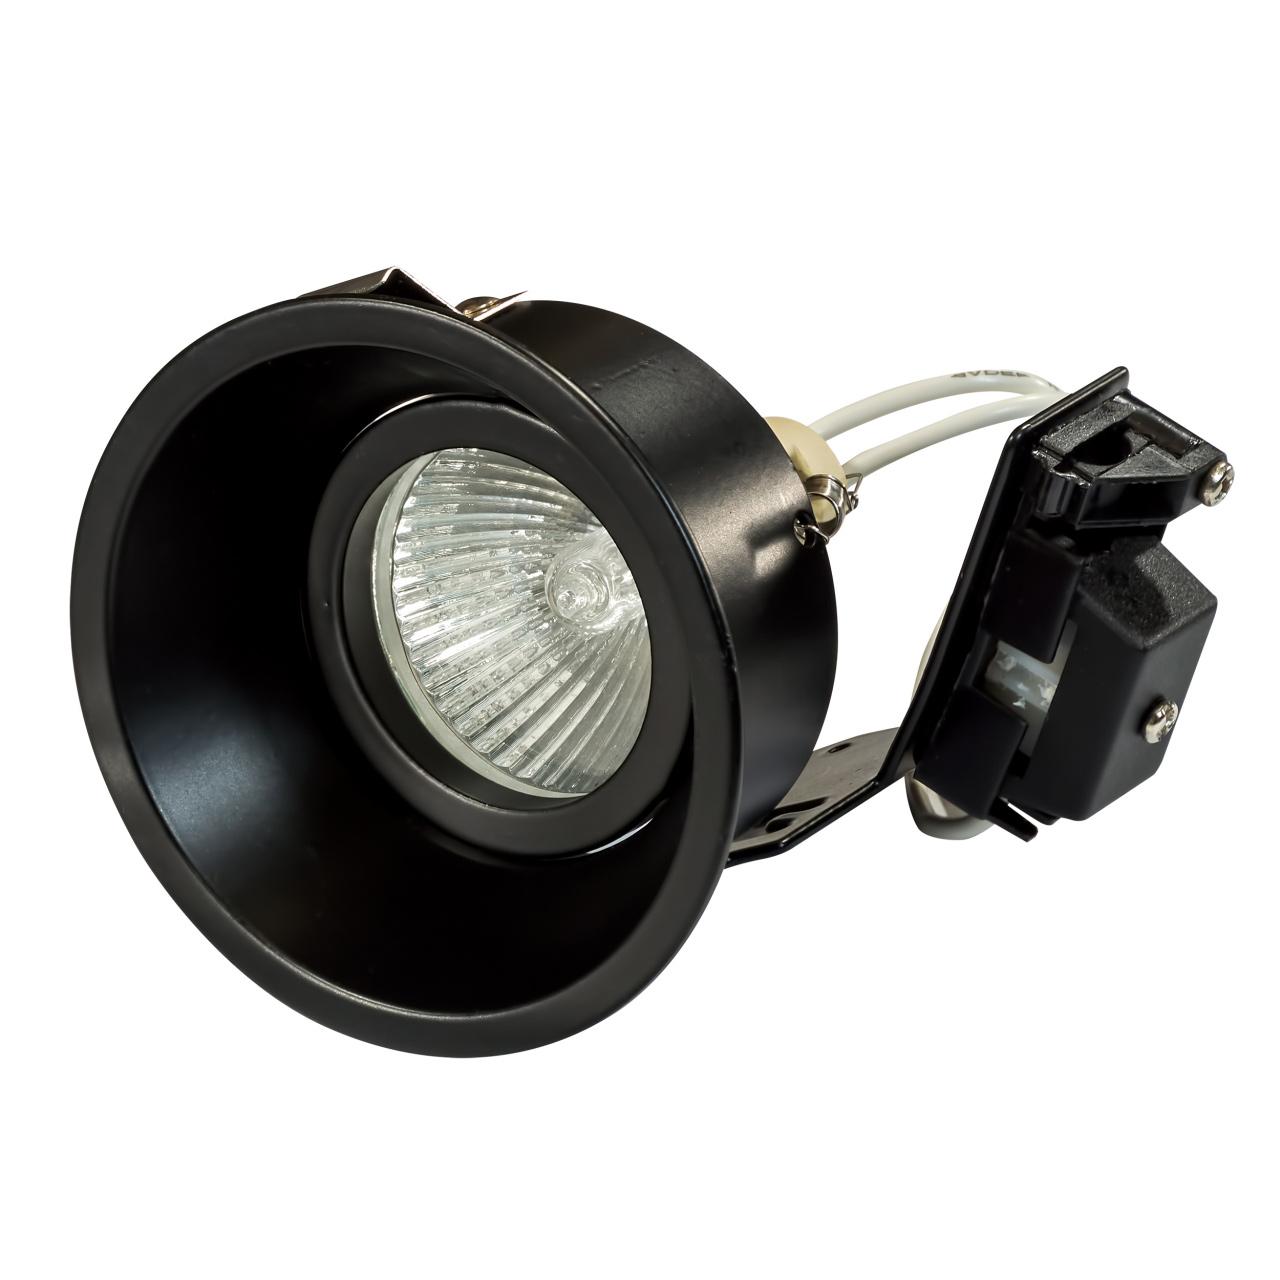 Светильник Domino round МR16 черный Lightstar 214607